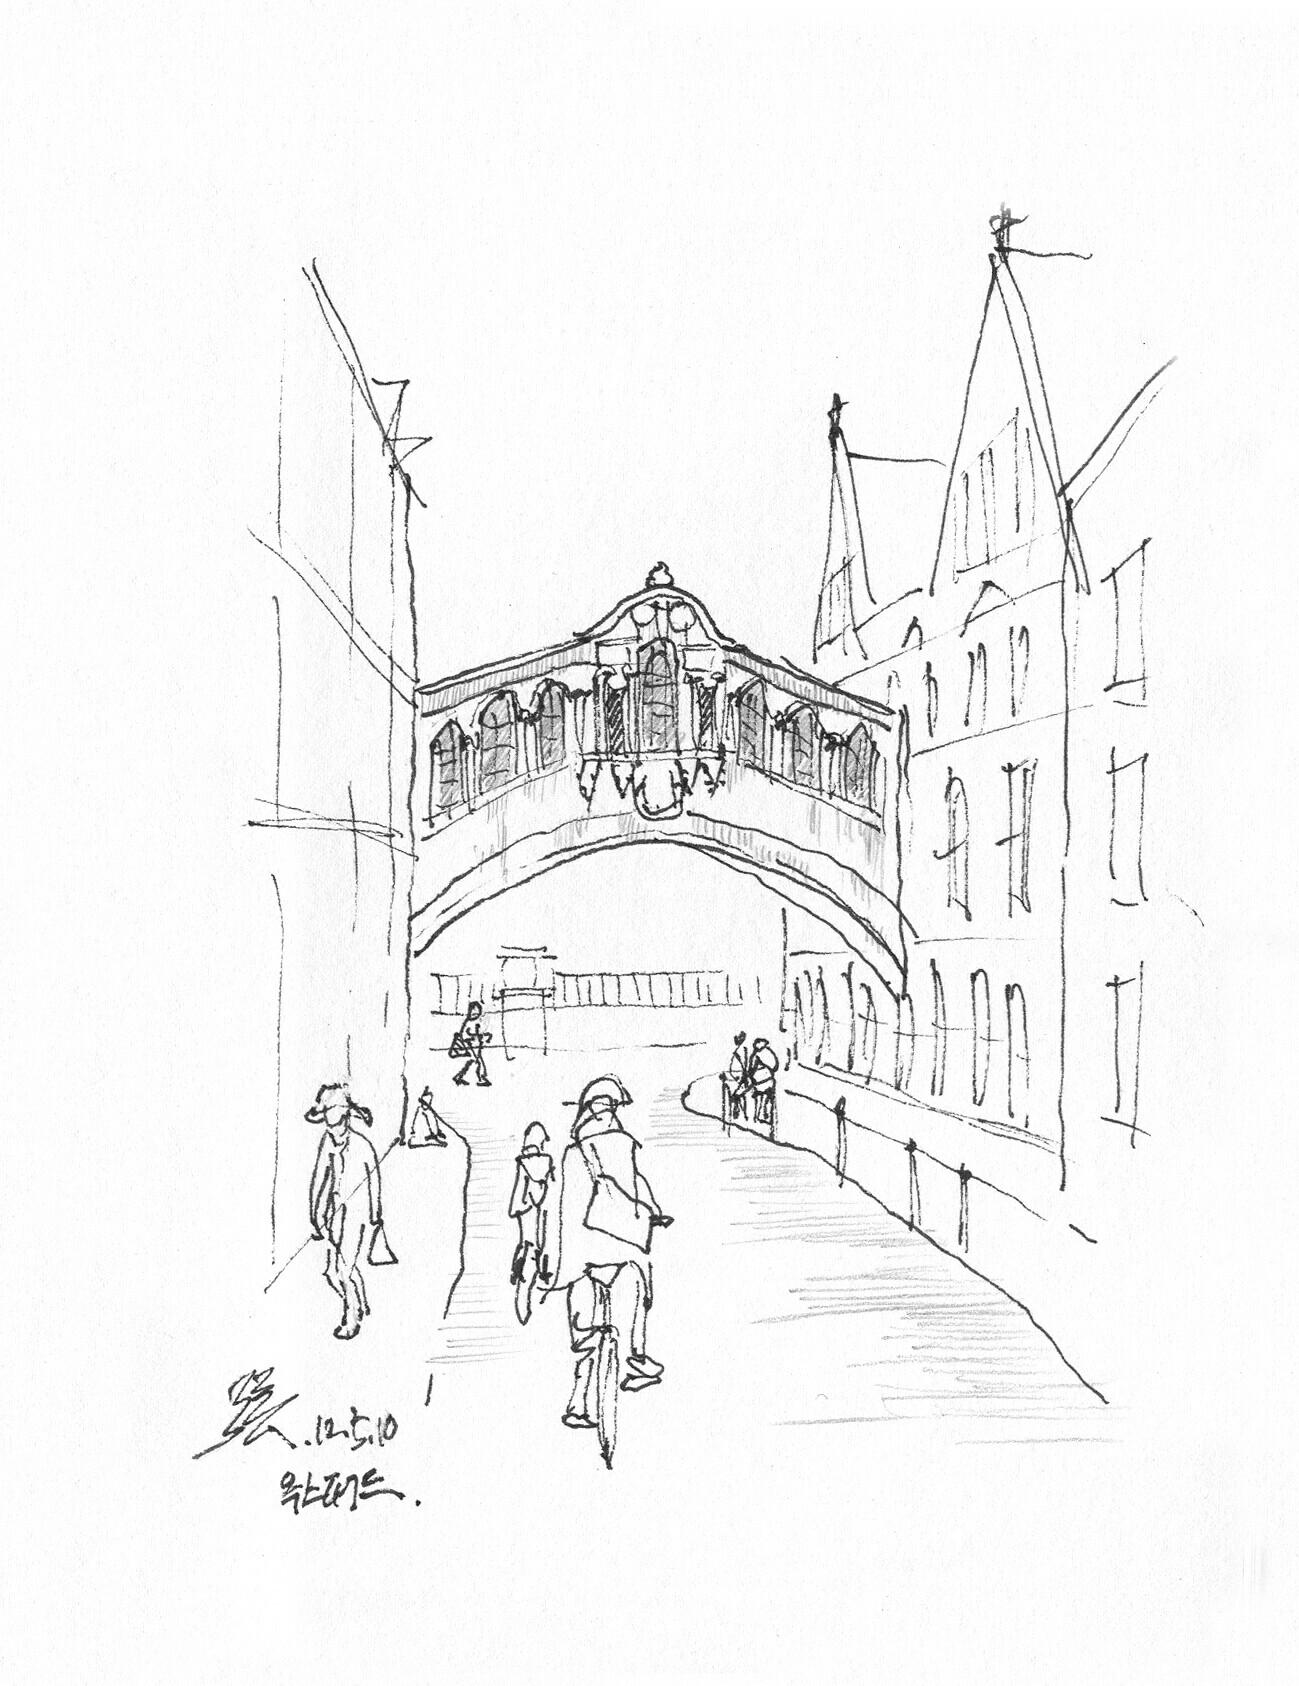 arch bridge drawing at getdrawings com